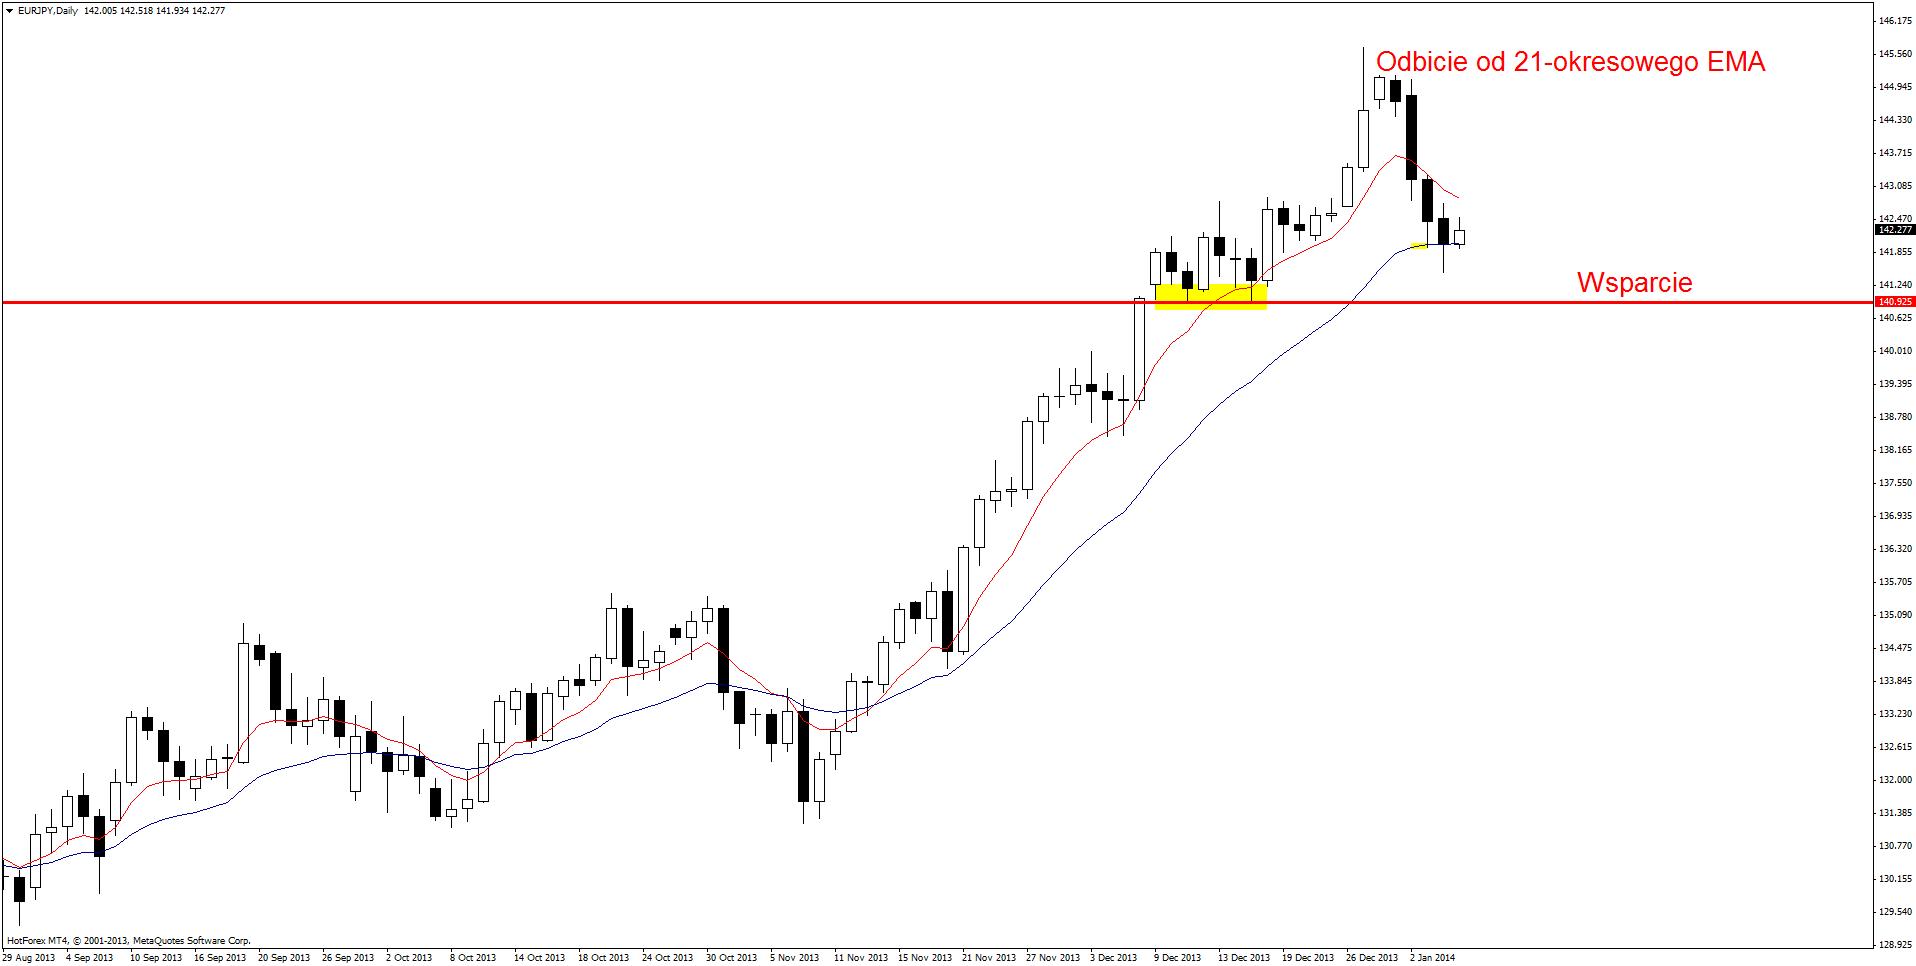 Setupy Price Action 7 stycznia 2014: EURJPY, EURUSD, GBP/USD, USD/JPY